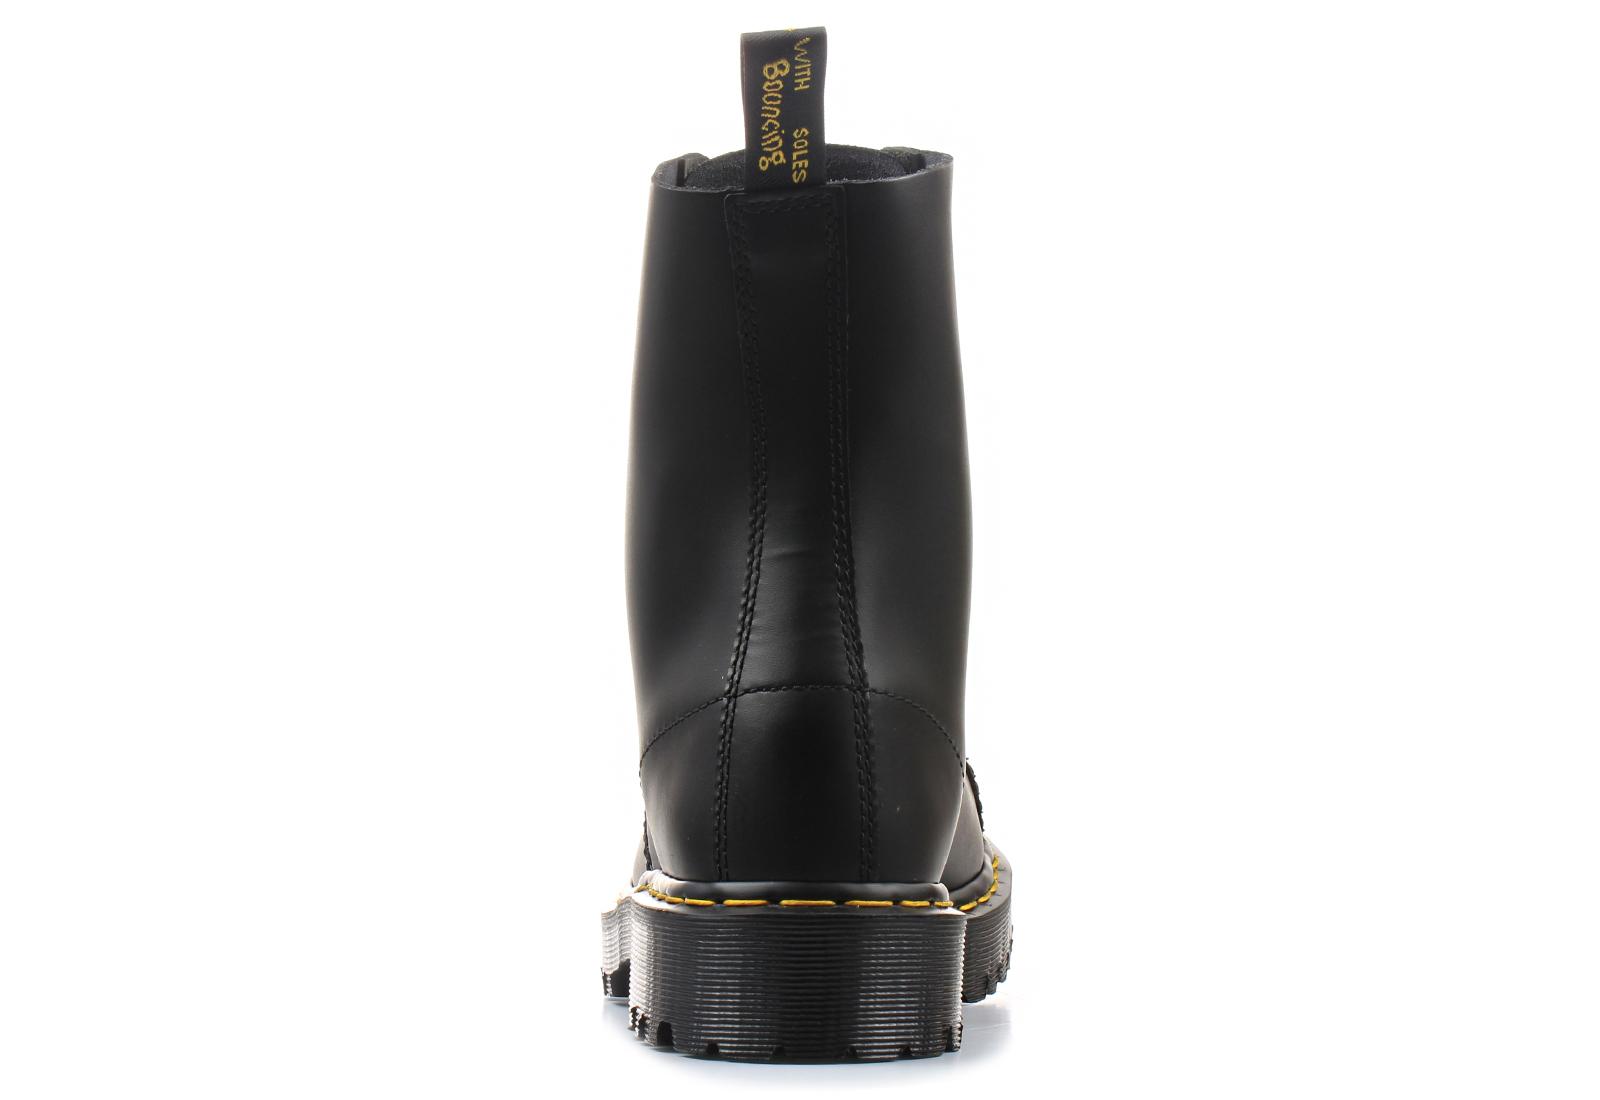 f59e4f53e08a Dr Martens Boots - 8761 - 10 Eye Boot - DM10966001 - Online shop for ...